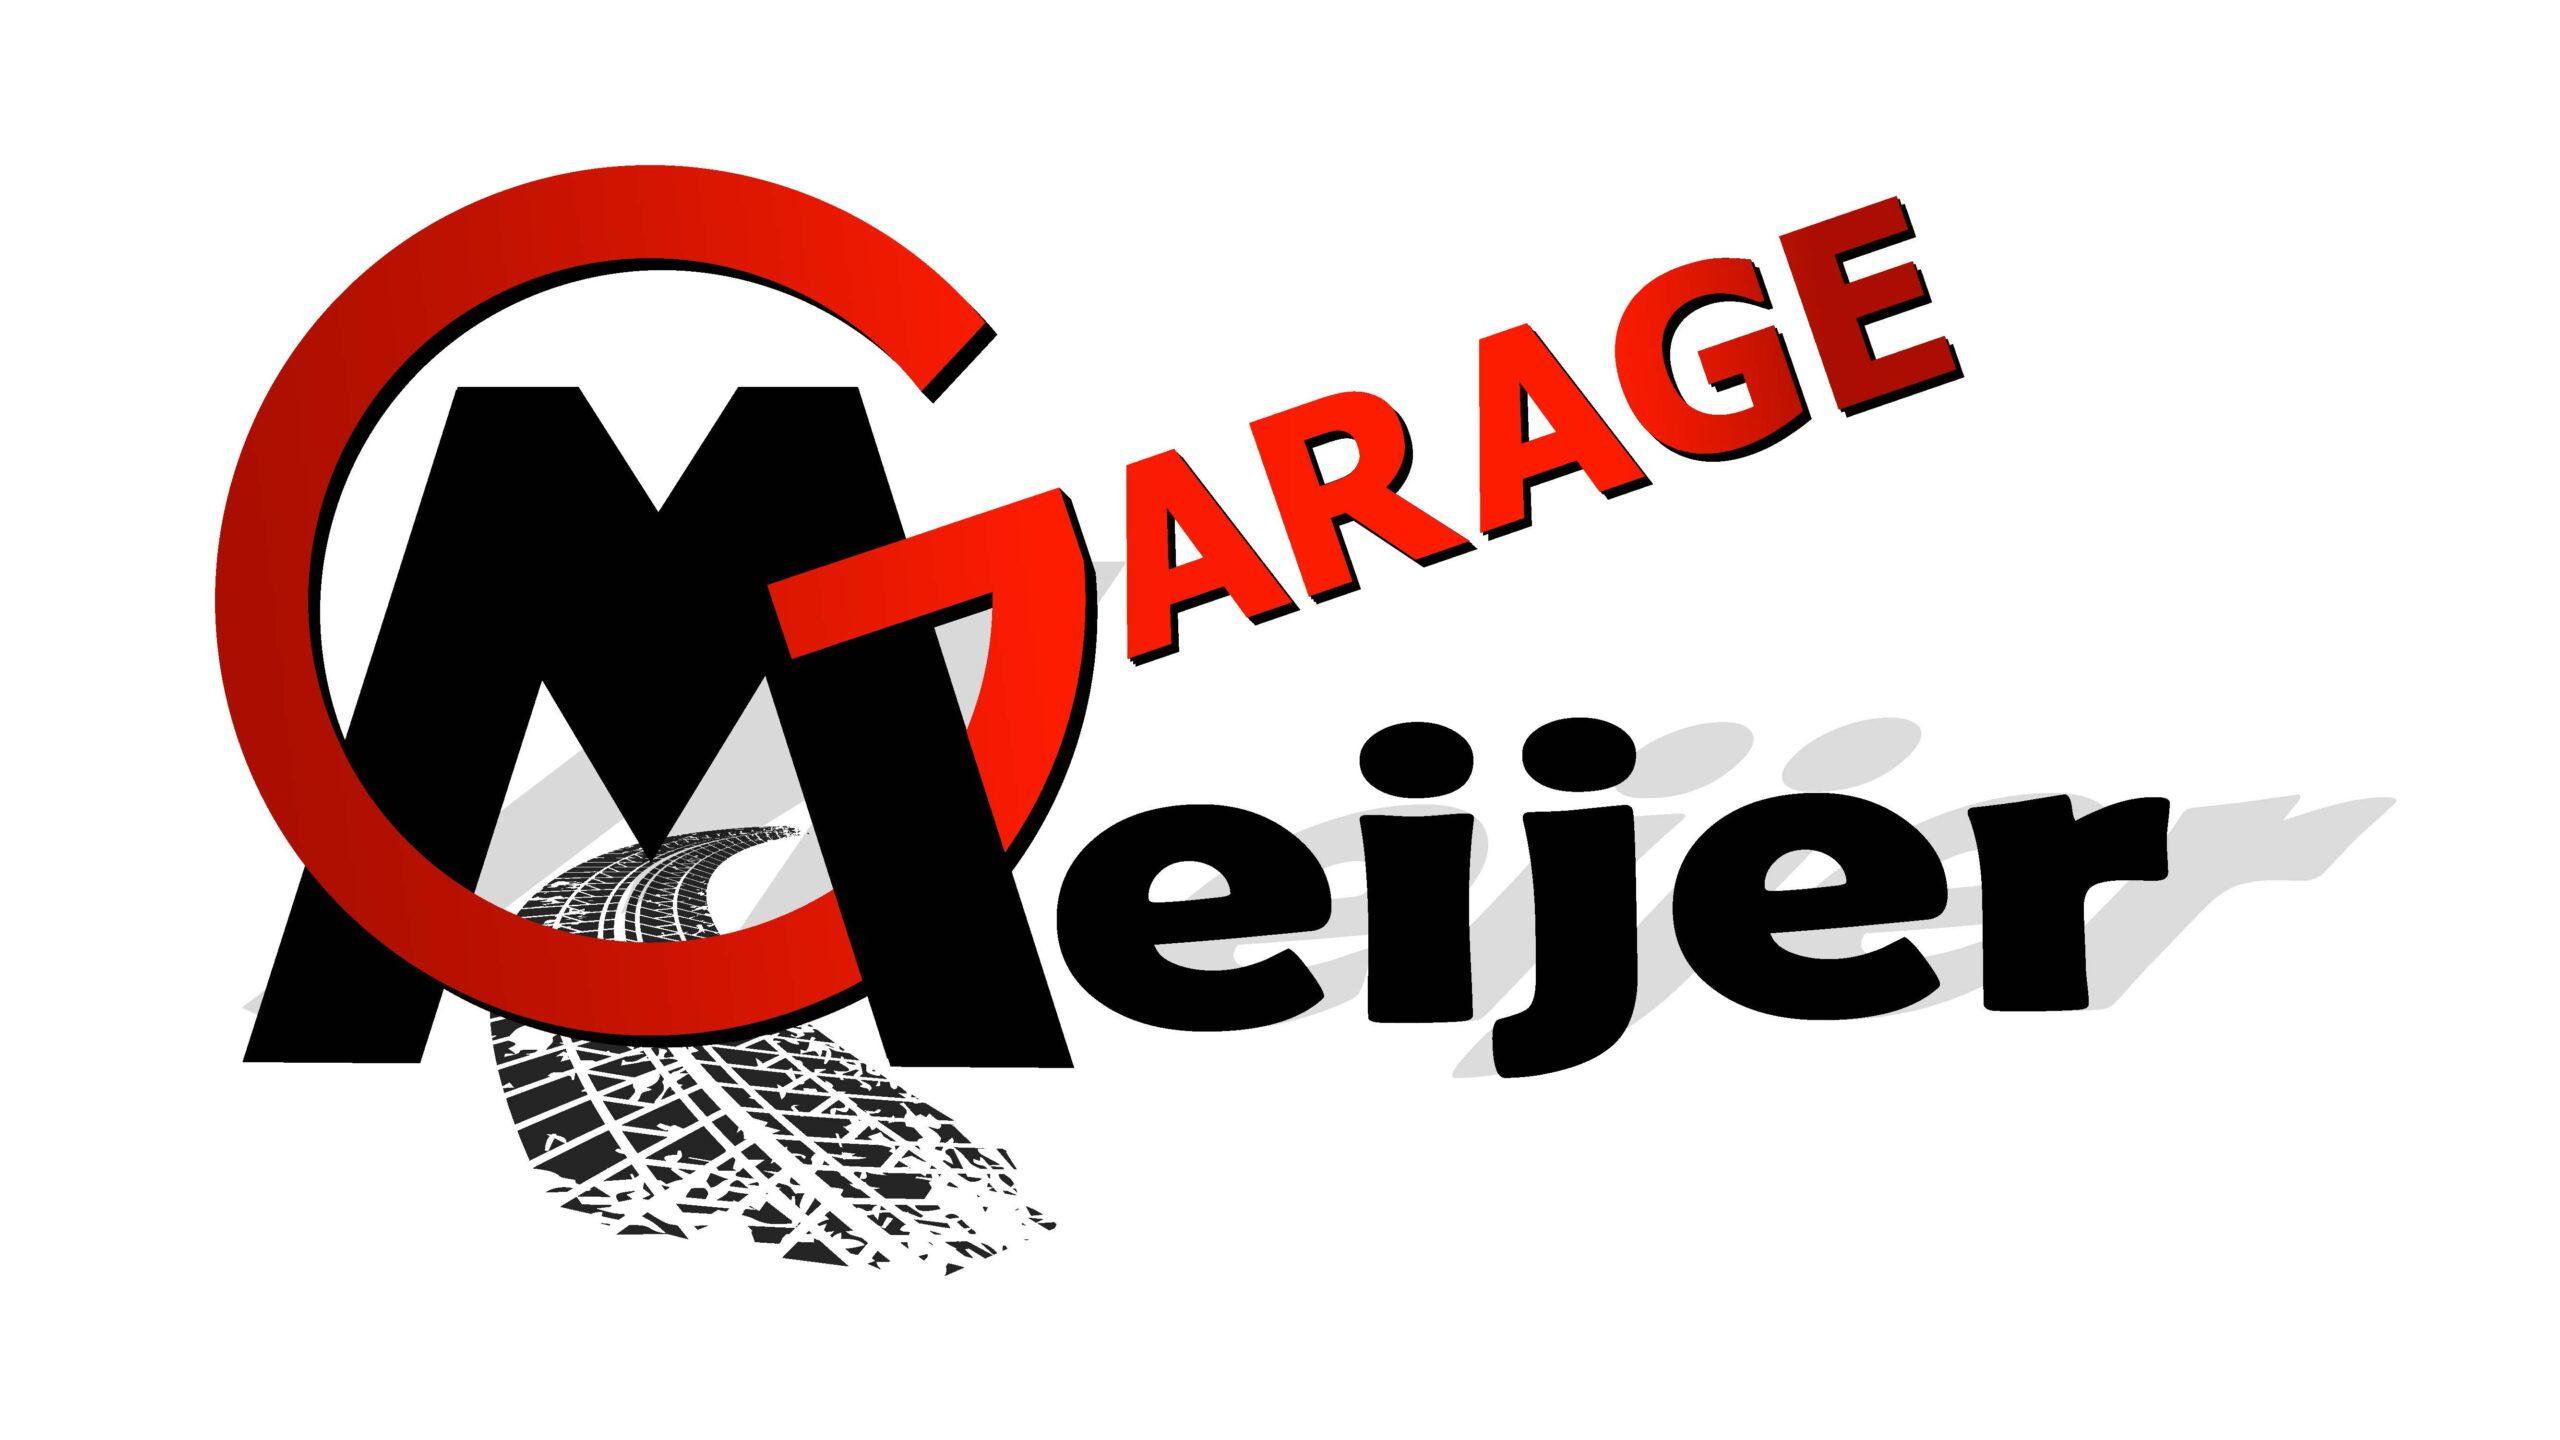 Garage Meijer